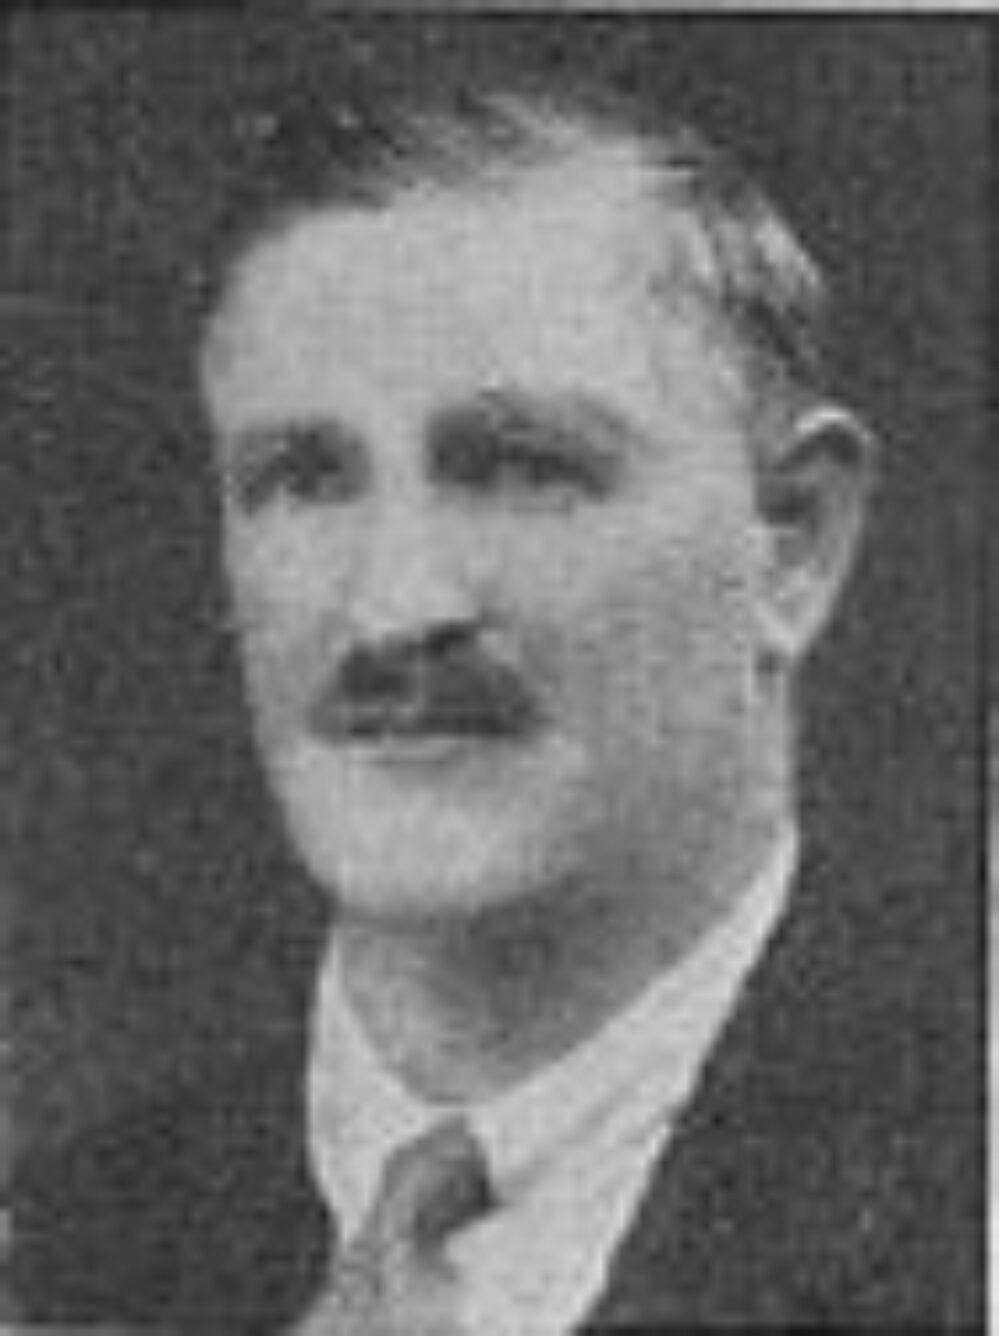 Sven Guttorm Olsen